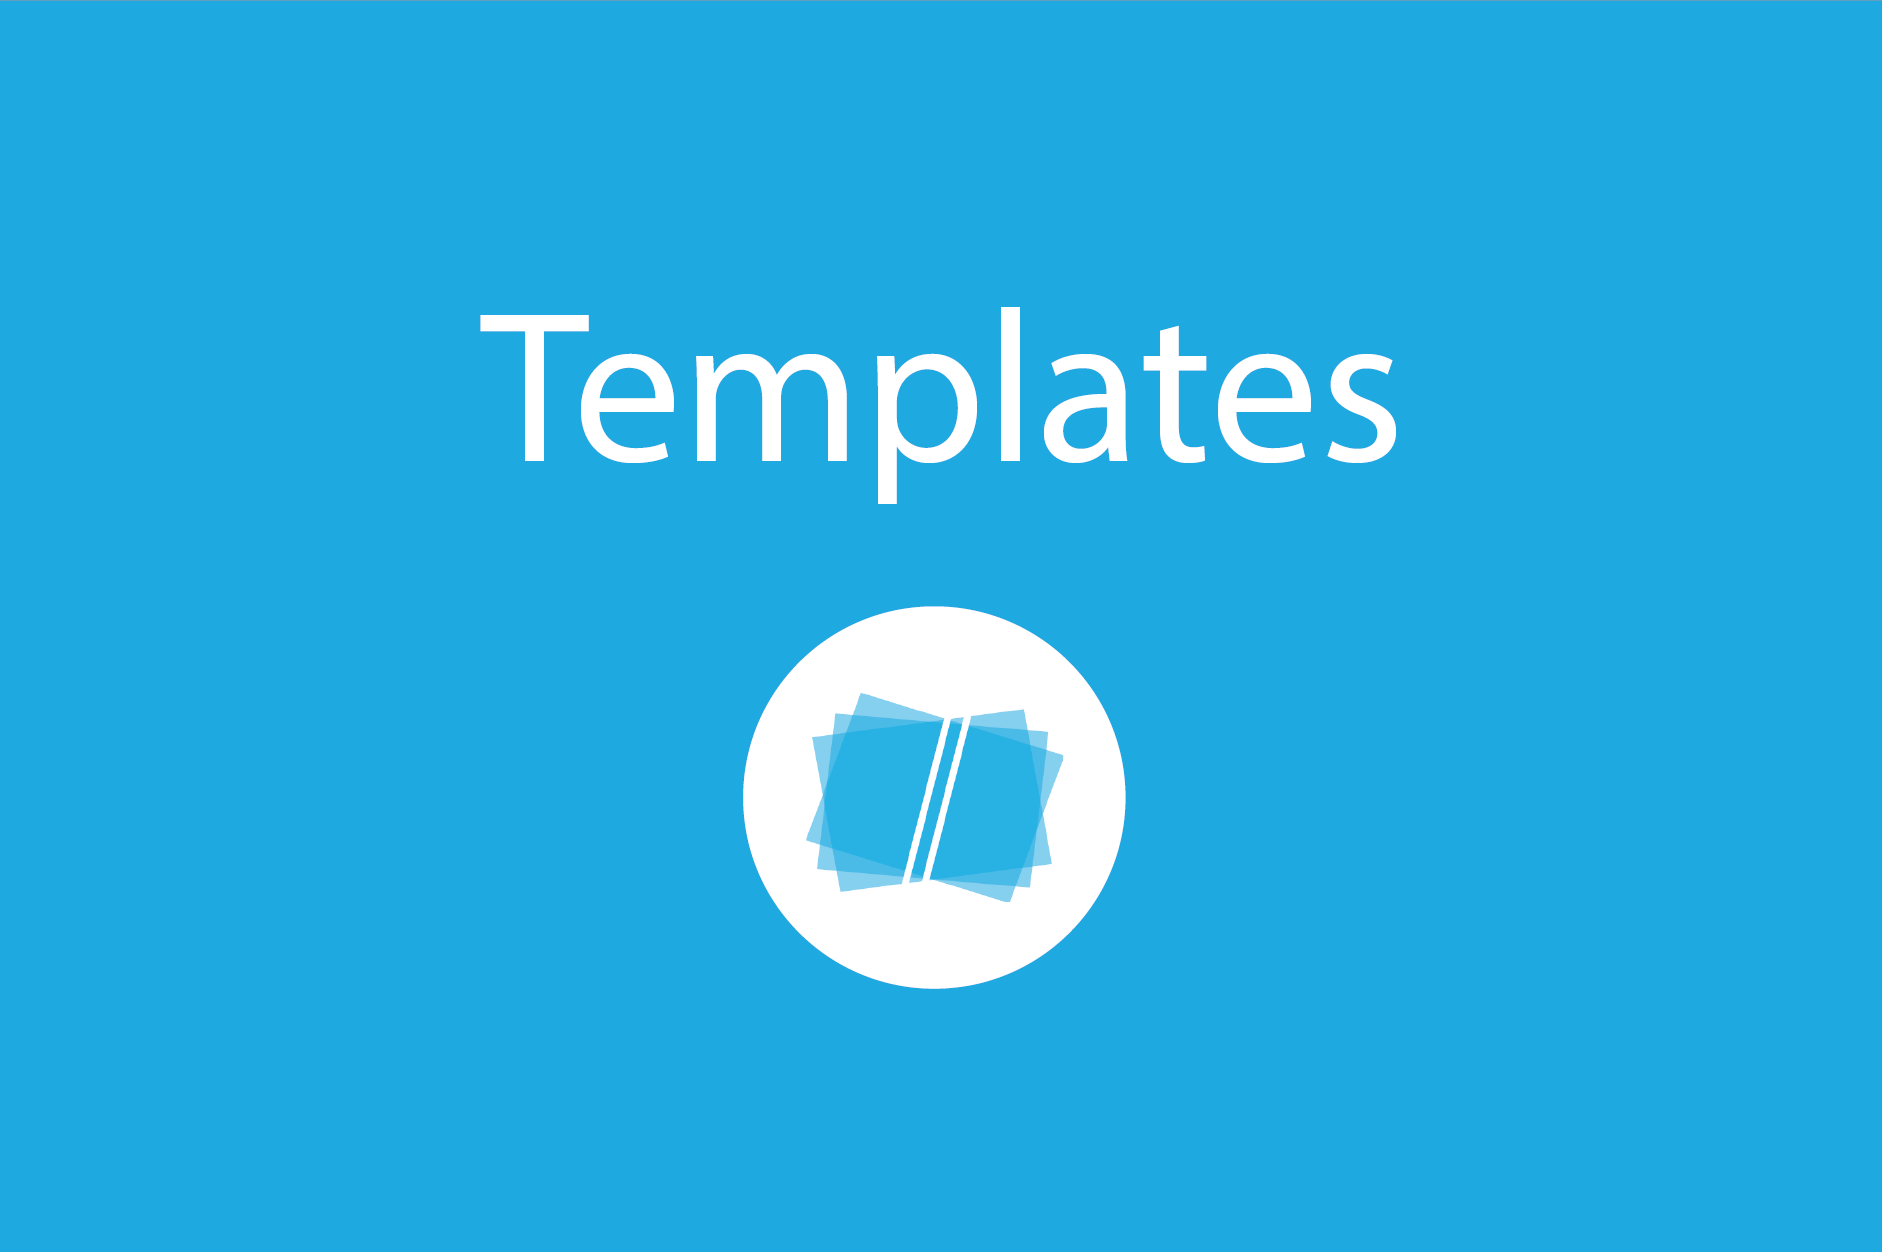 Templates_Blue (00018591xC5E42).PNG